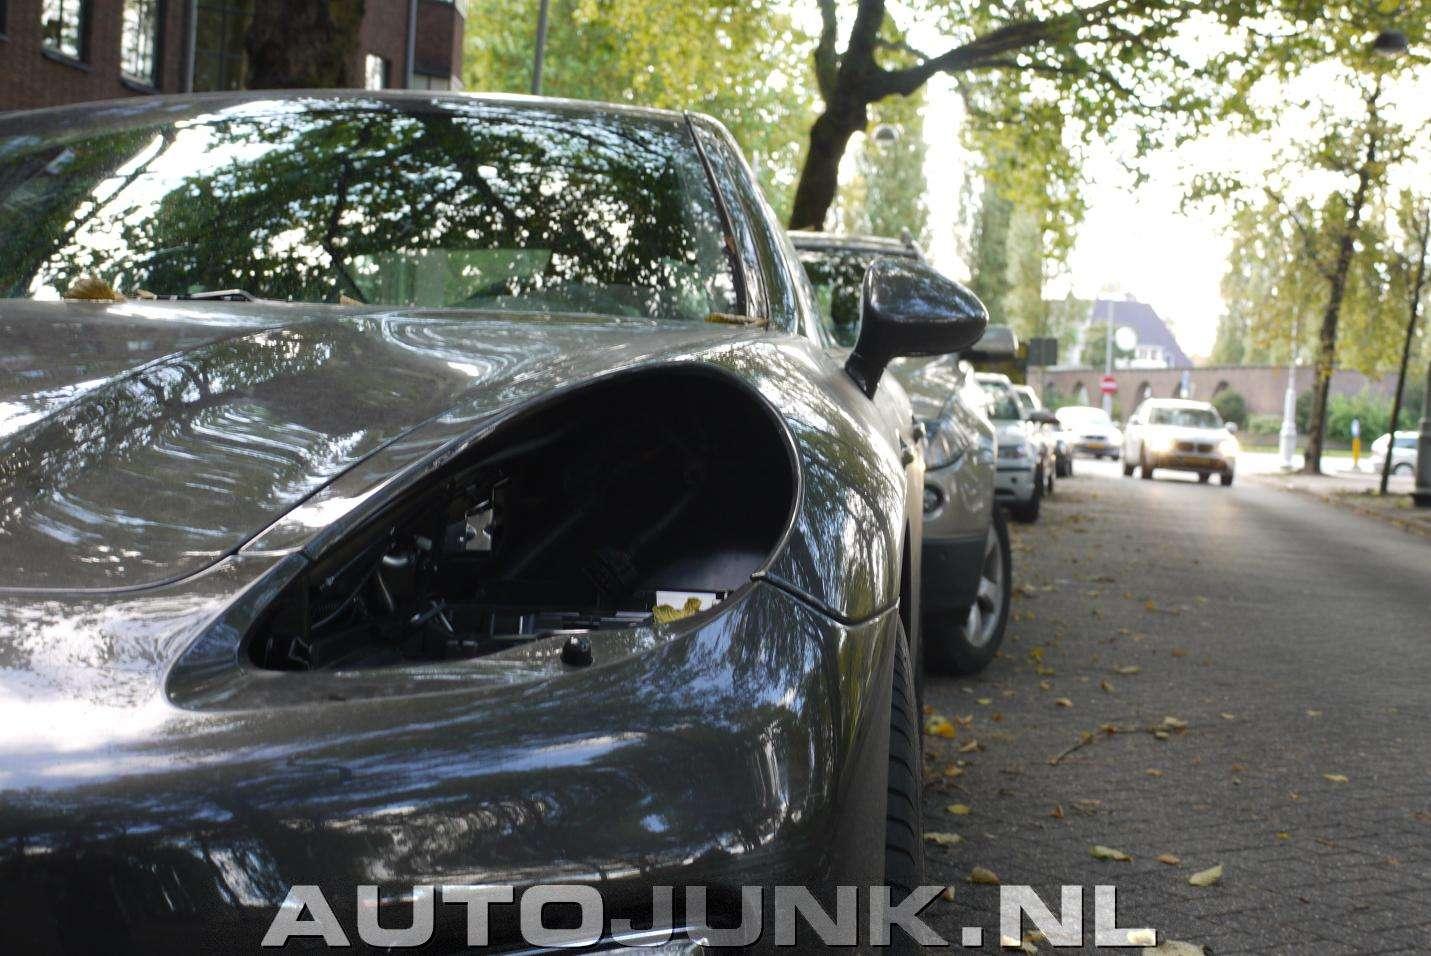 Stolen Porsche Headlights